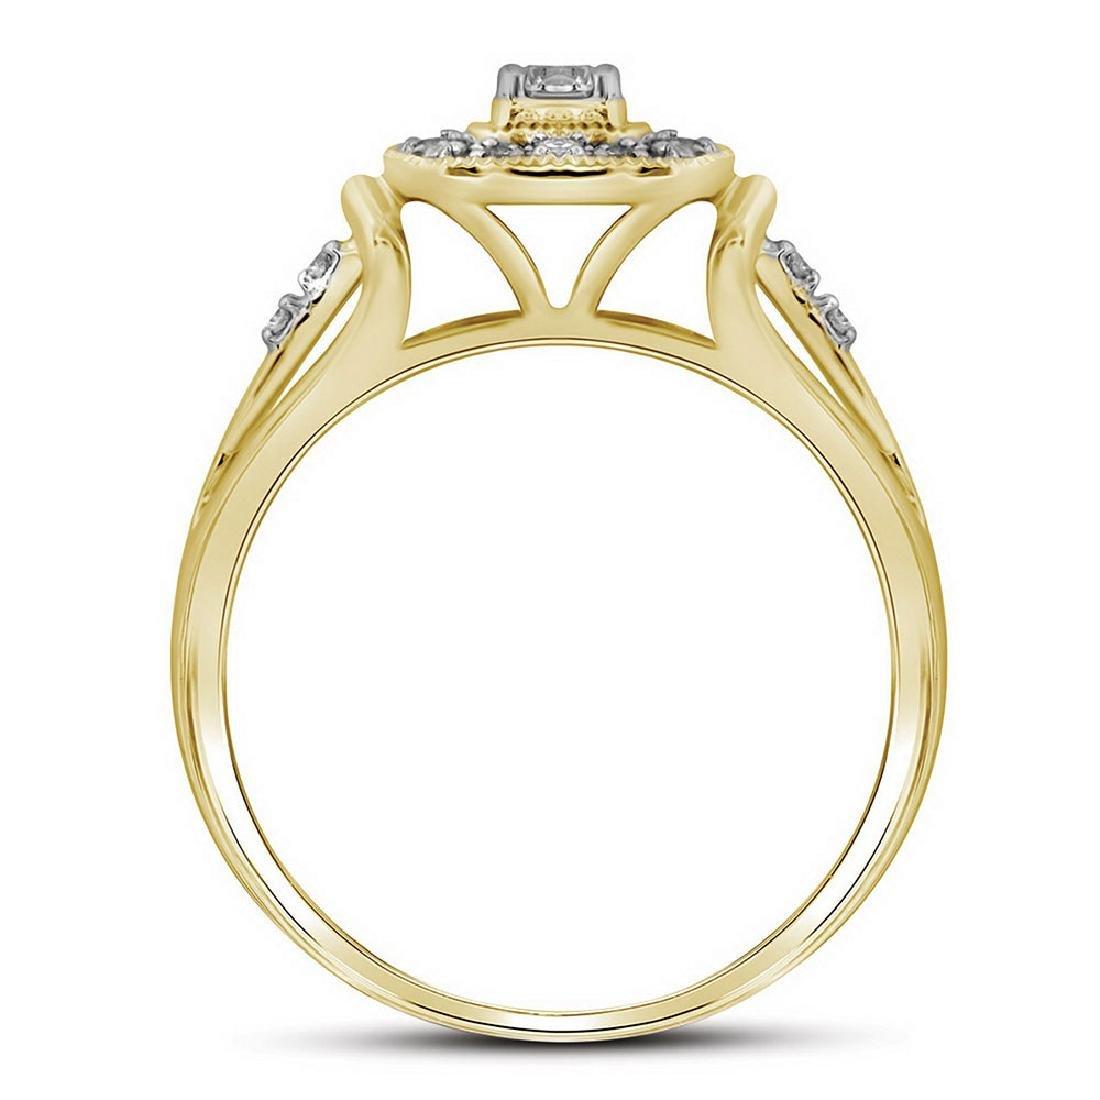 10kt Yellow Gold Round Diamond Square Bridal Wedding Ri - 2